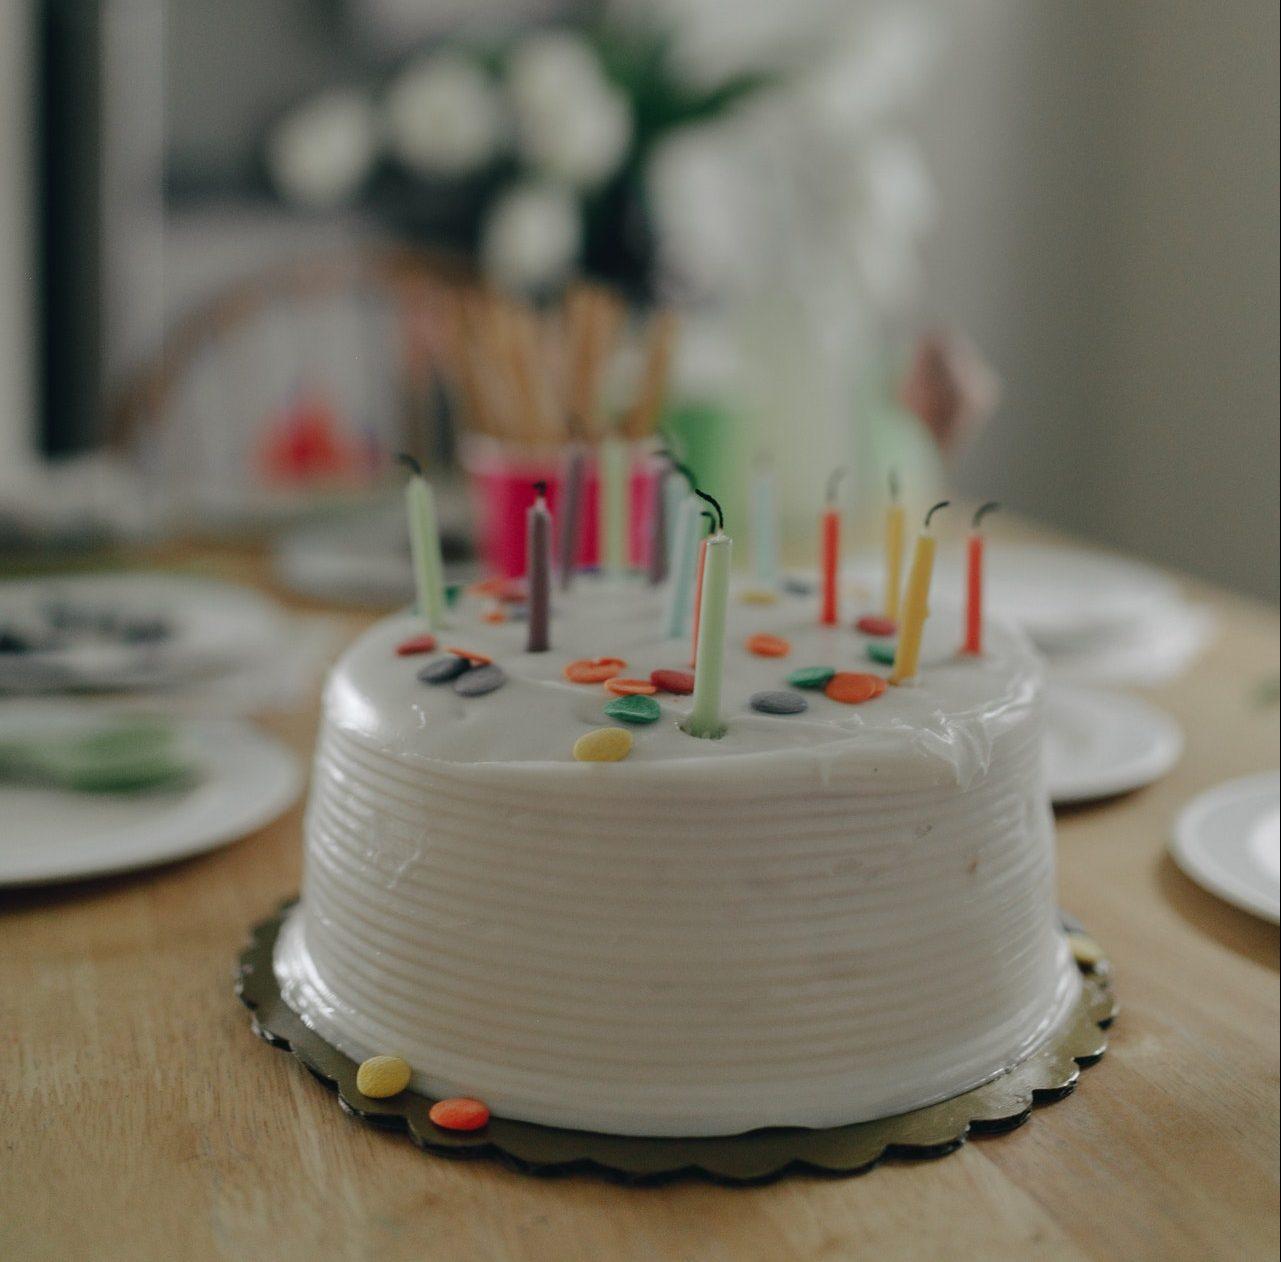 szuletesnapi torta e1619432611904